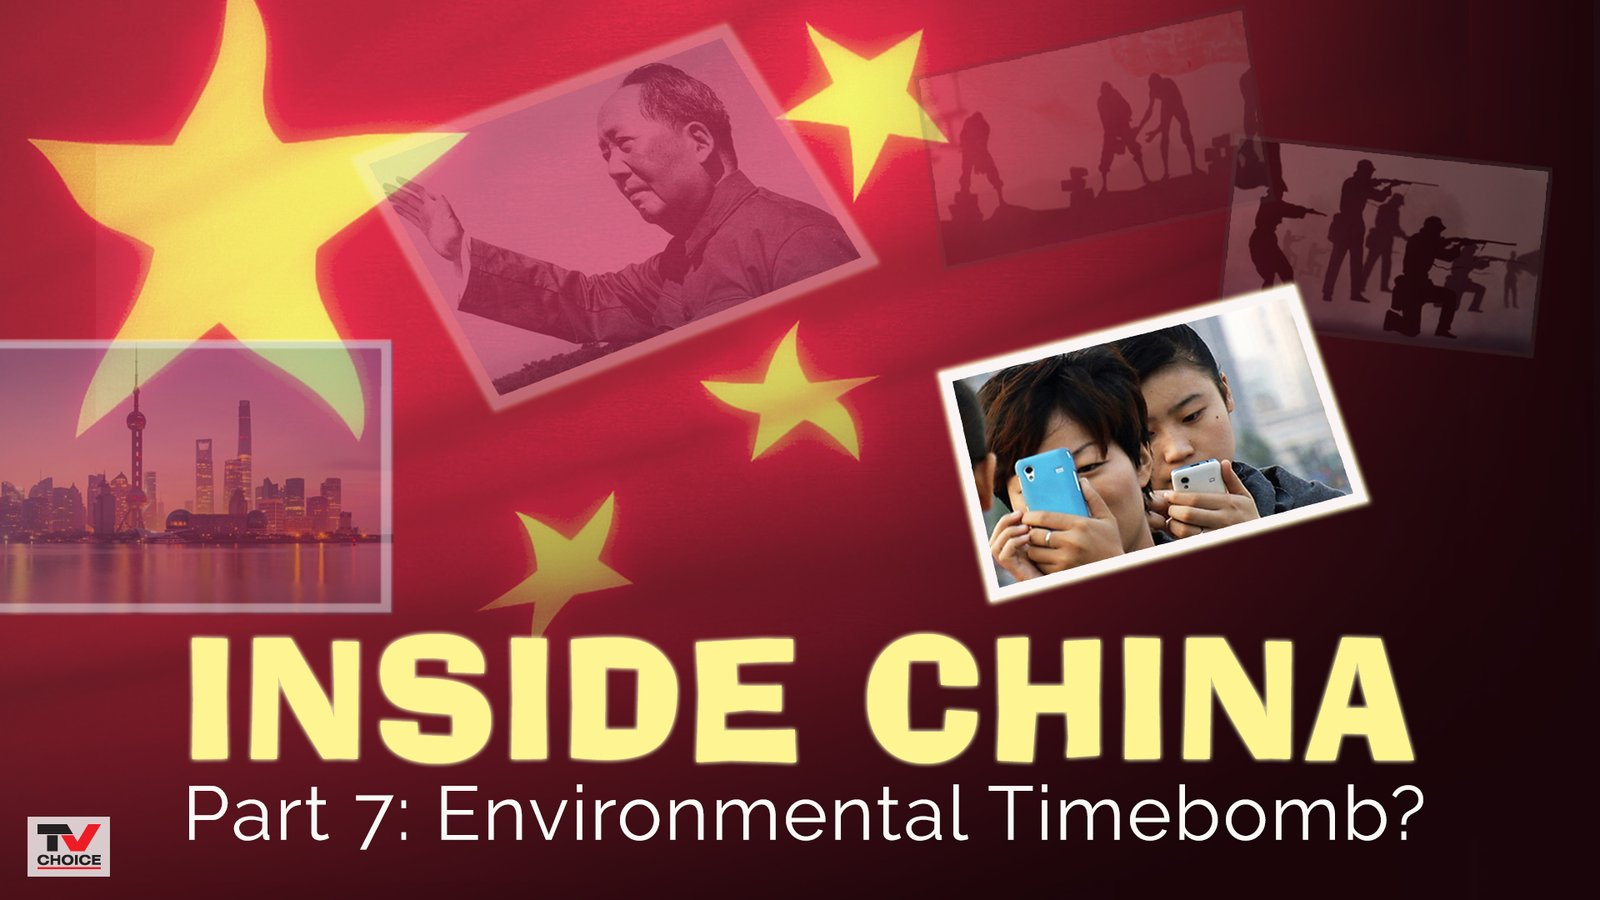 Inside China 7: Environmental Timebomb?